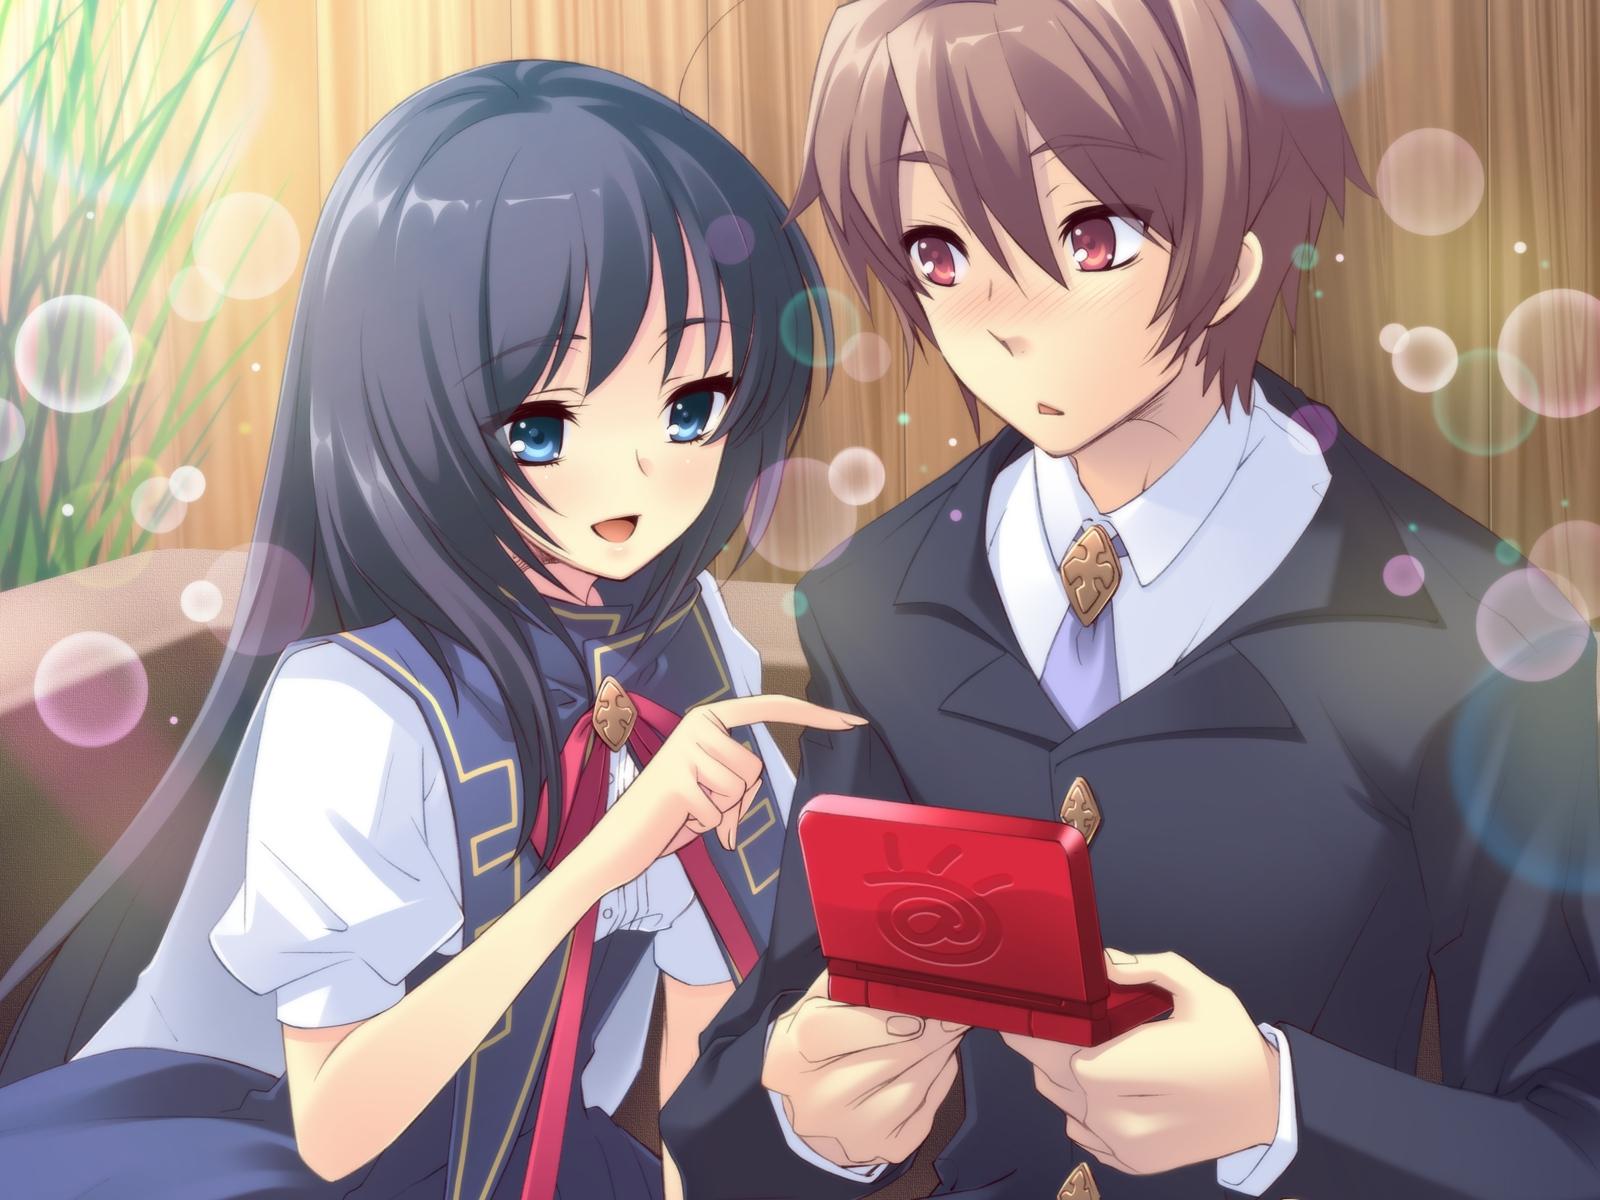 blush bubbles flyable_heart game_cg itou_noiji katsuragi_syo school_uniform shirasagi_mayuri